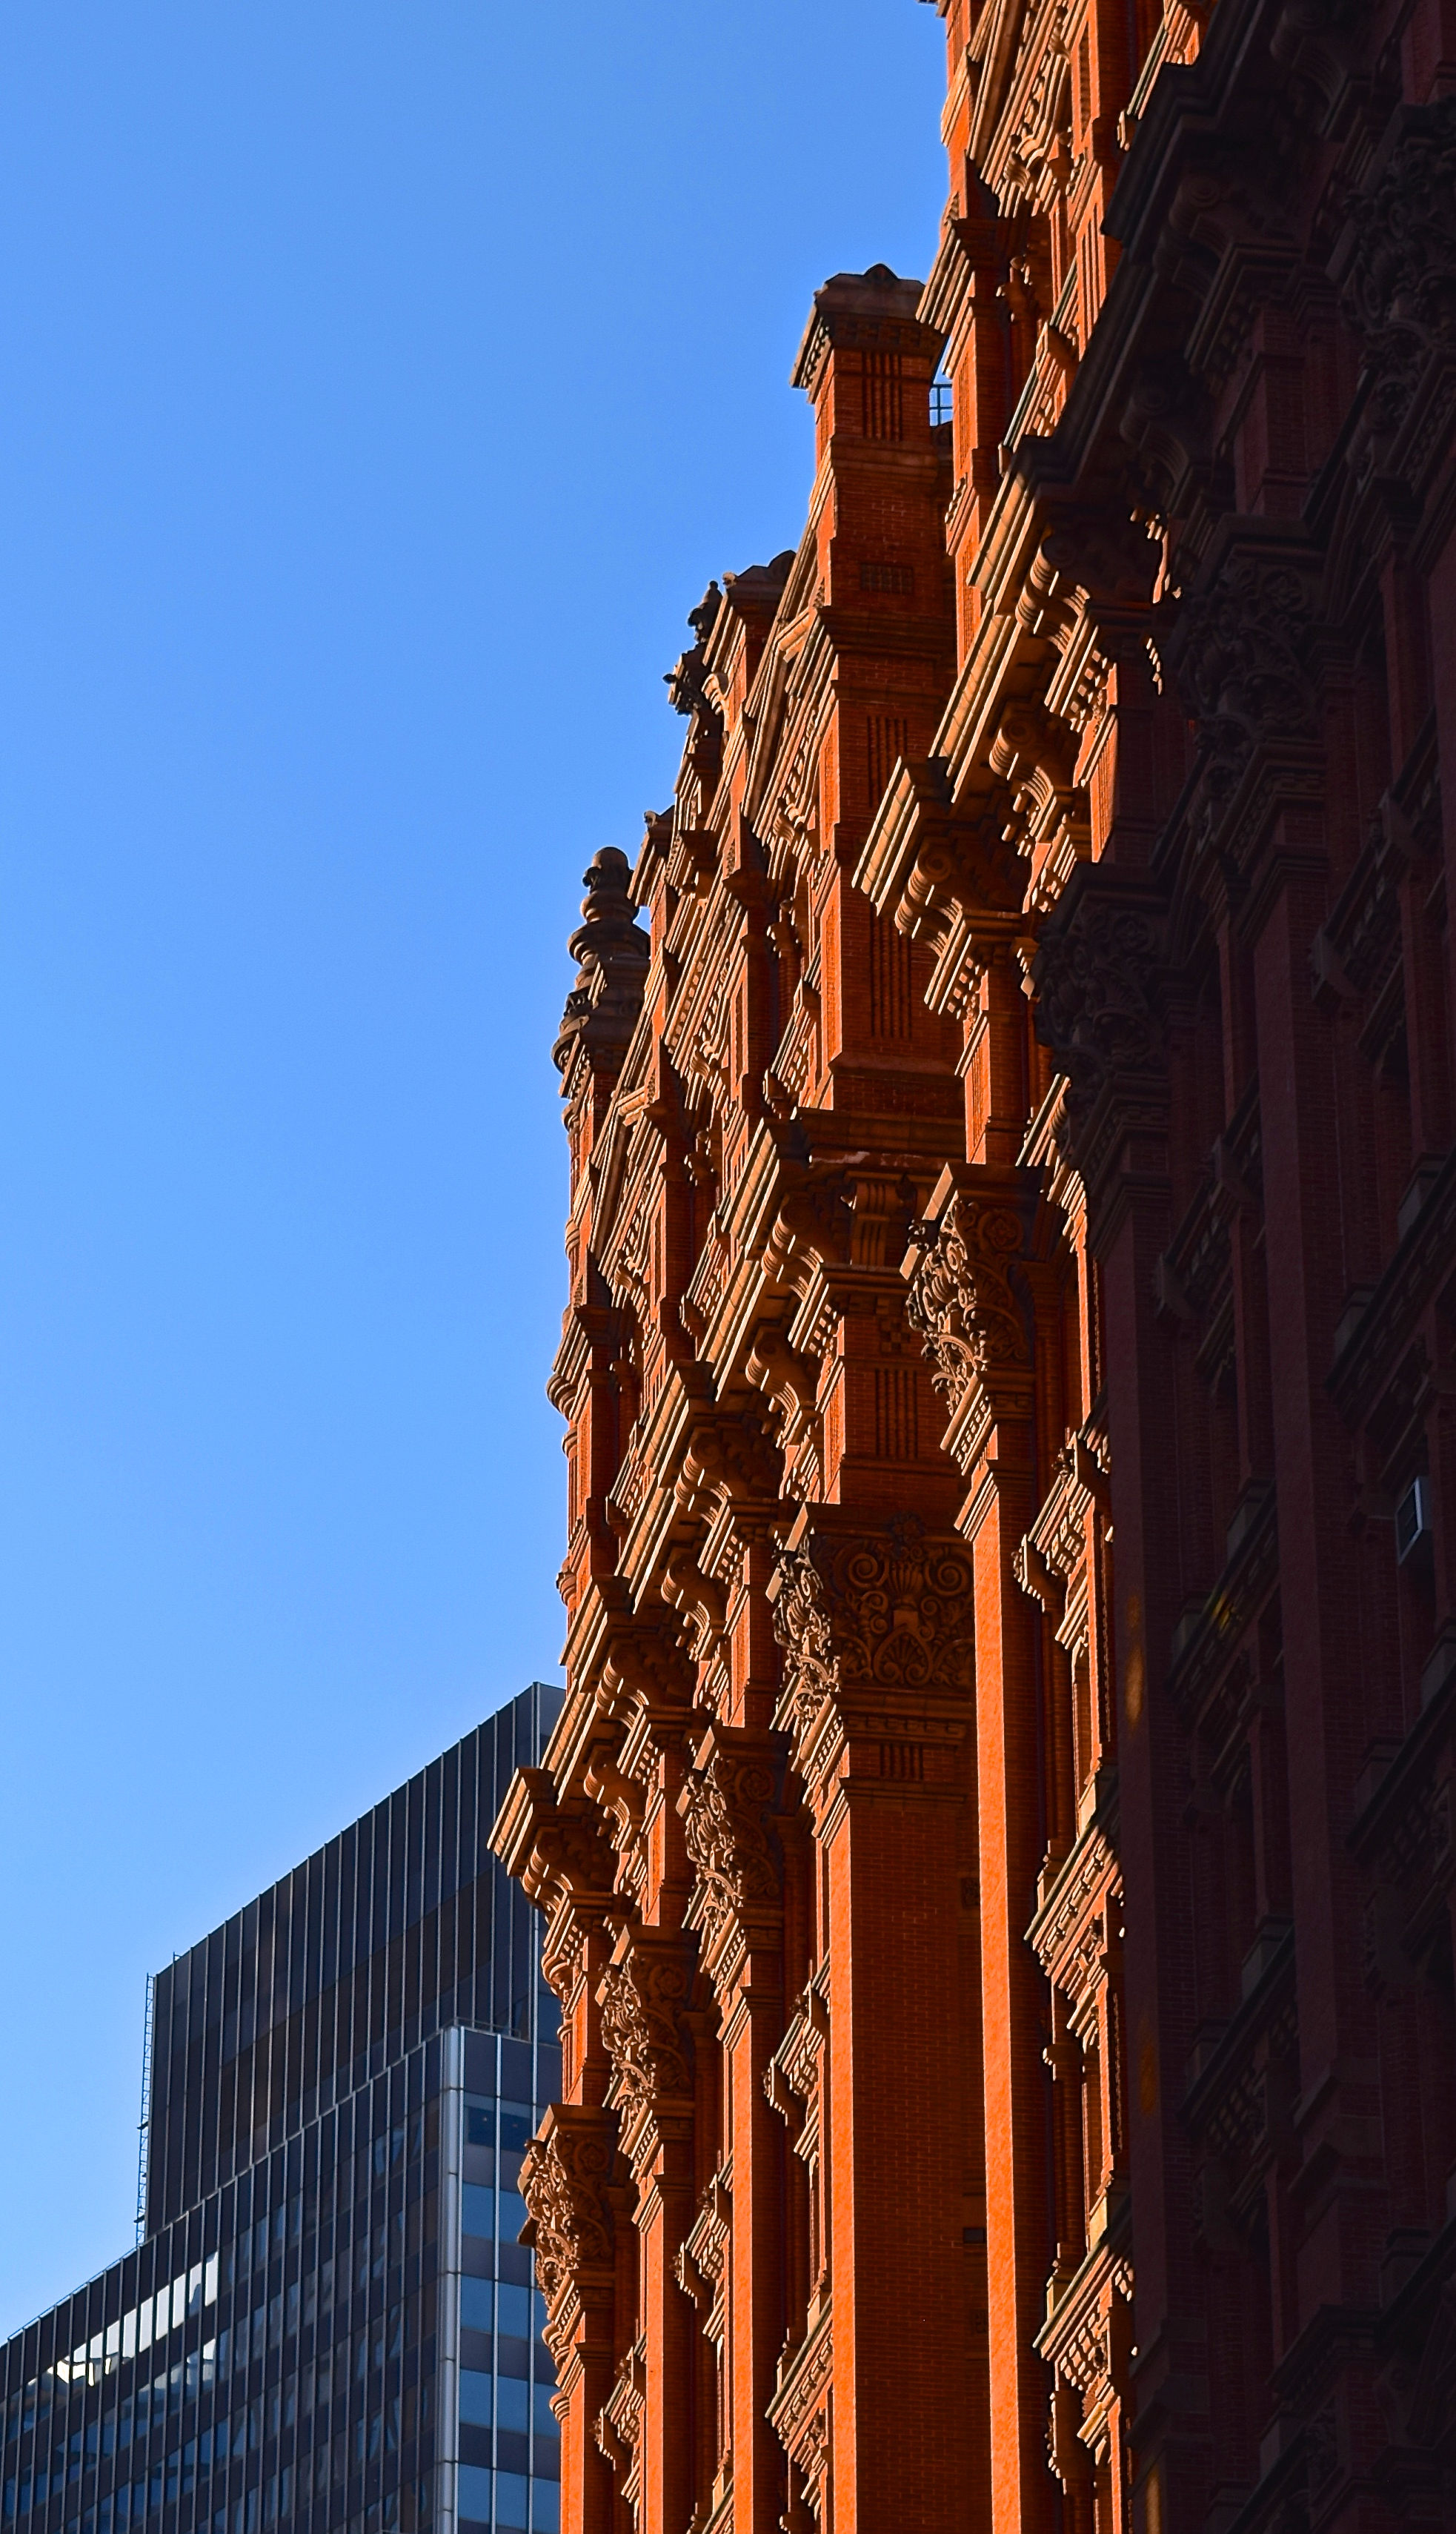 The Potter Building, 38 Park Row